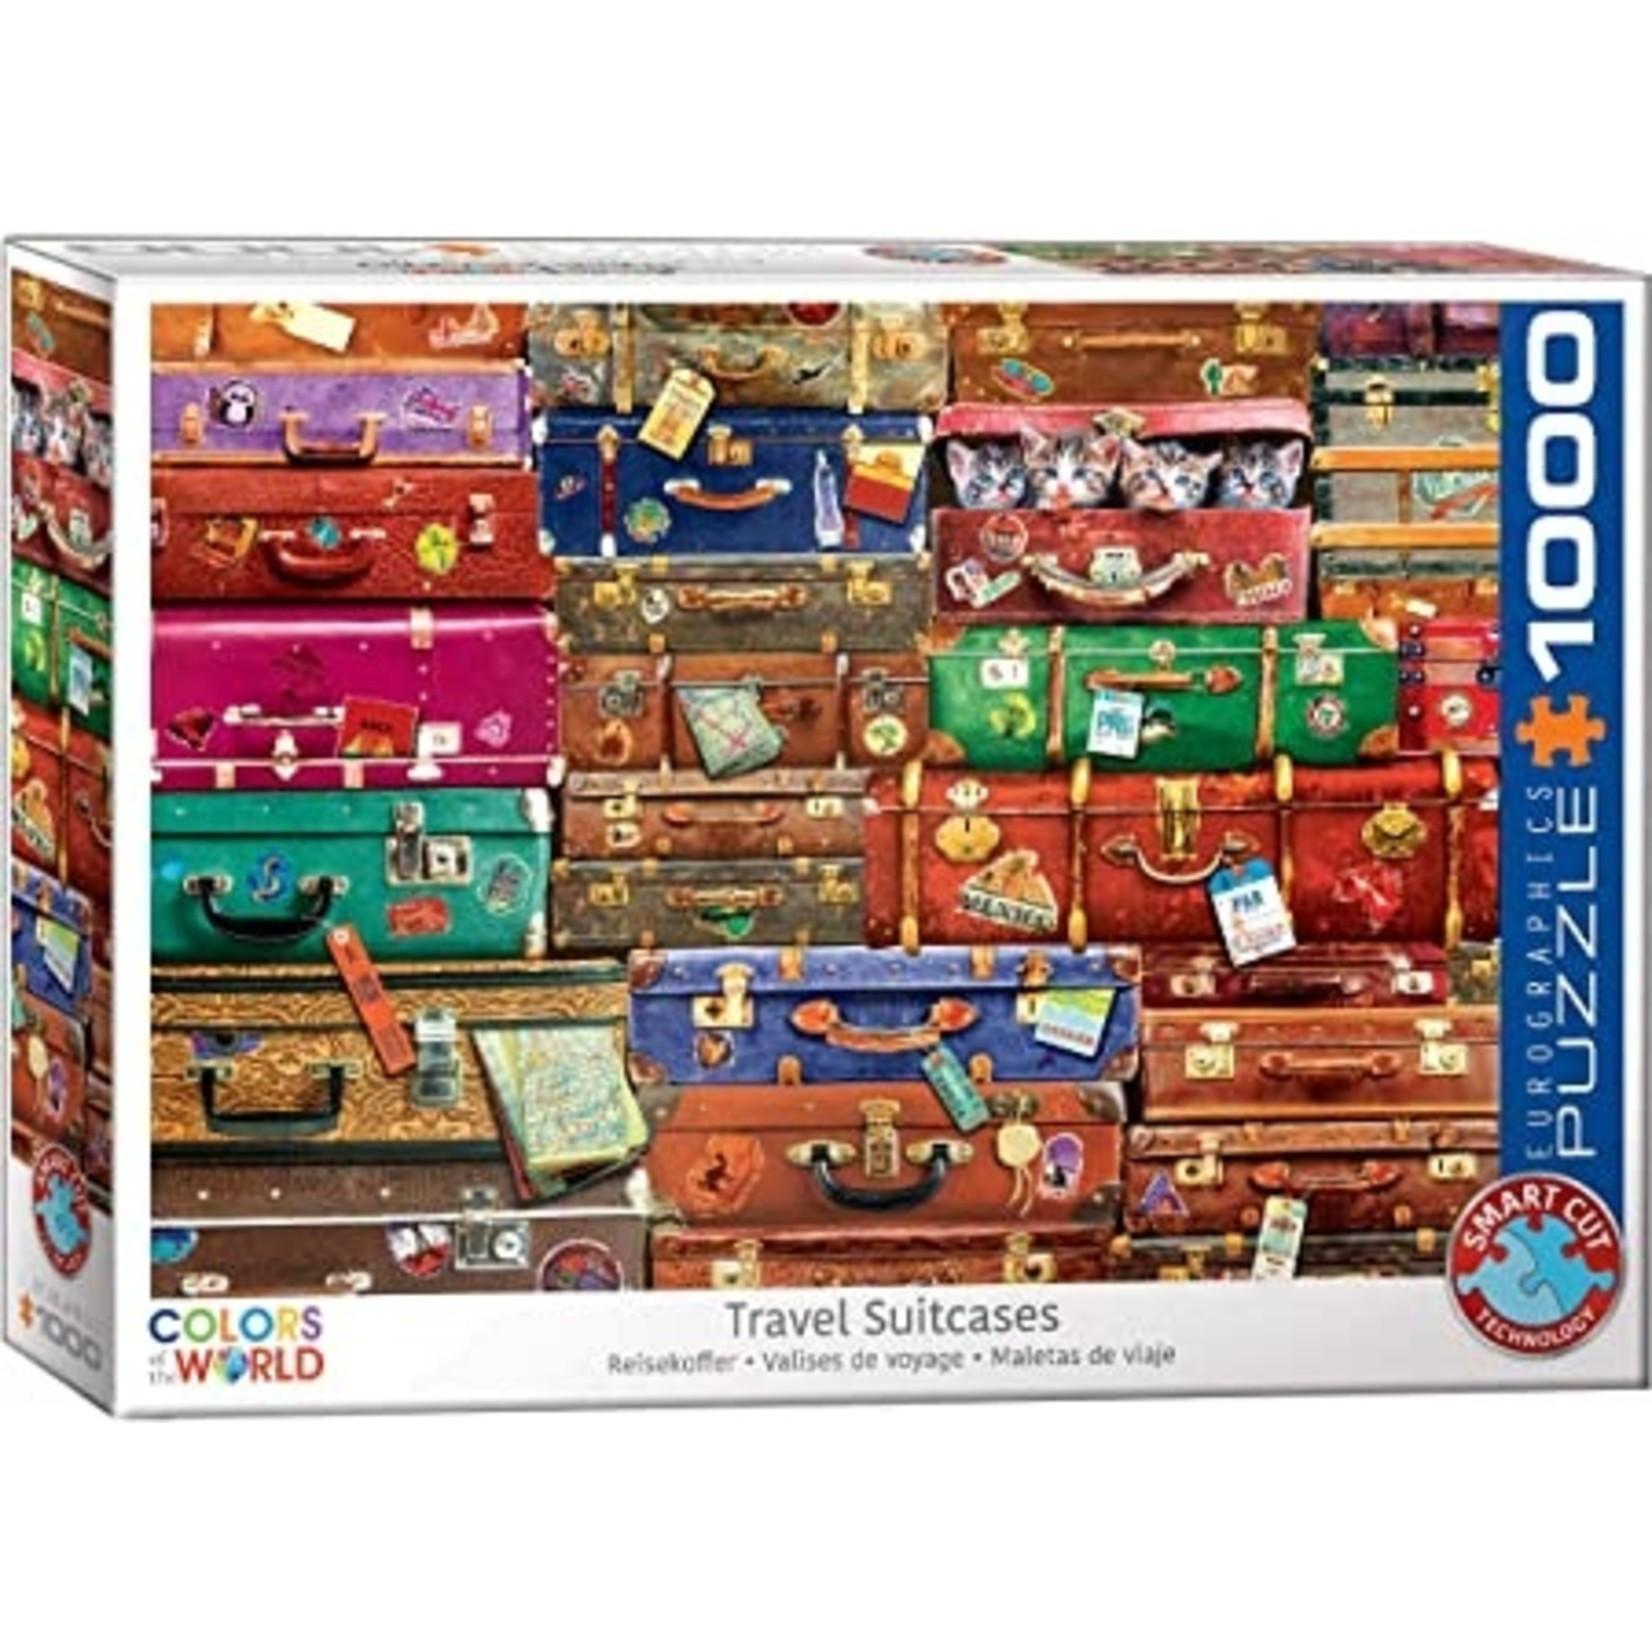 EuroGraphics Puzzles Travel Suitcases 1000 Pc